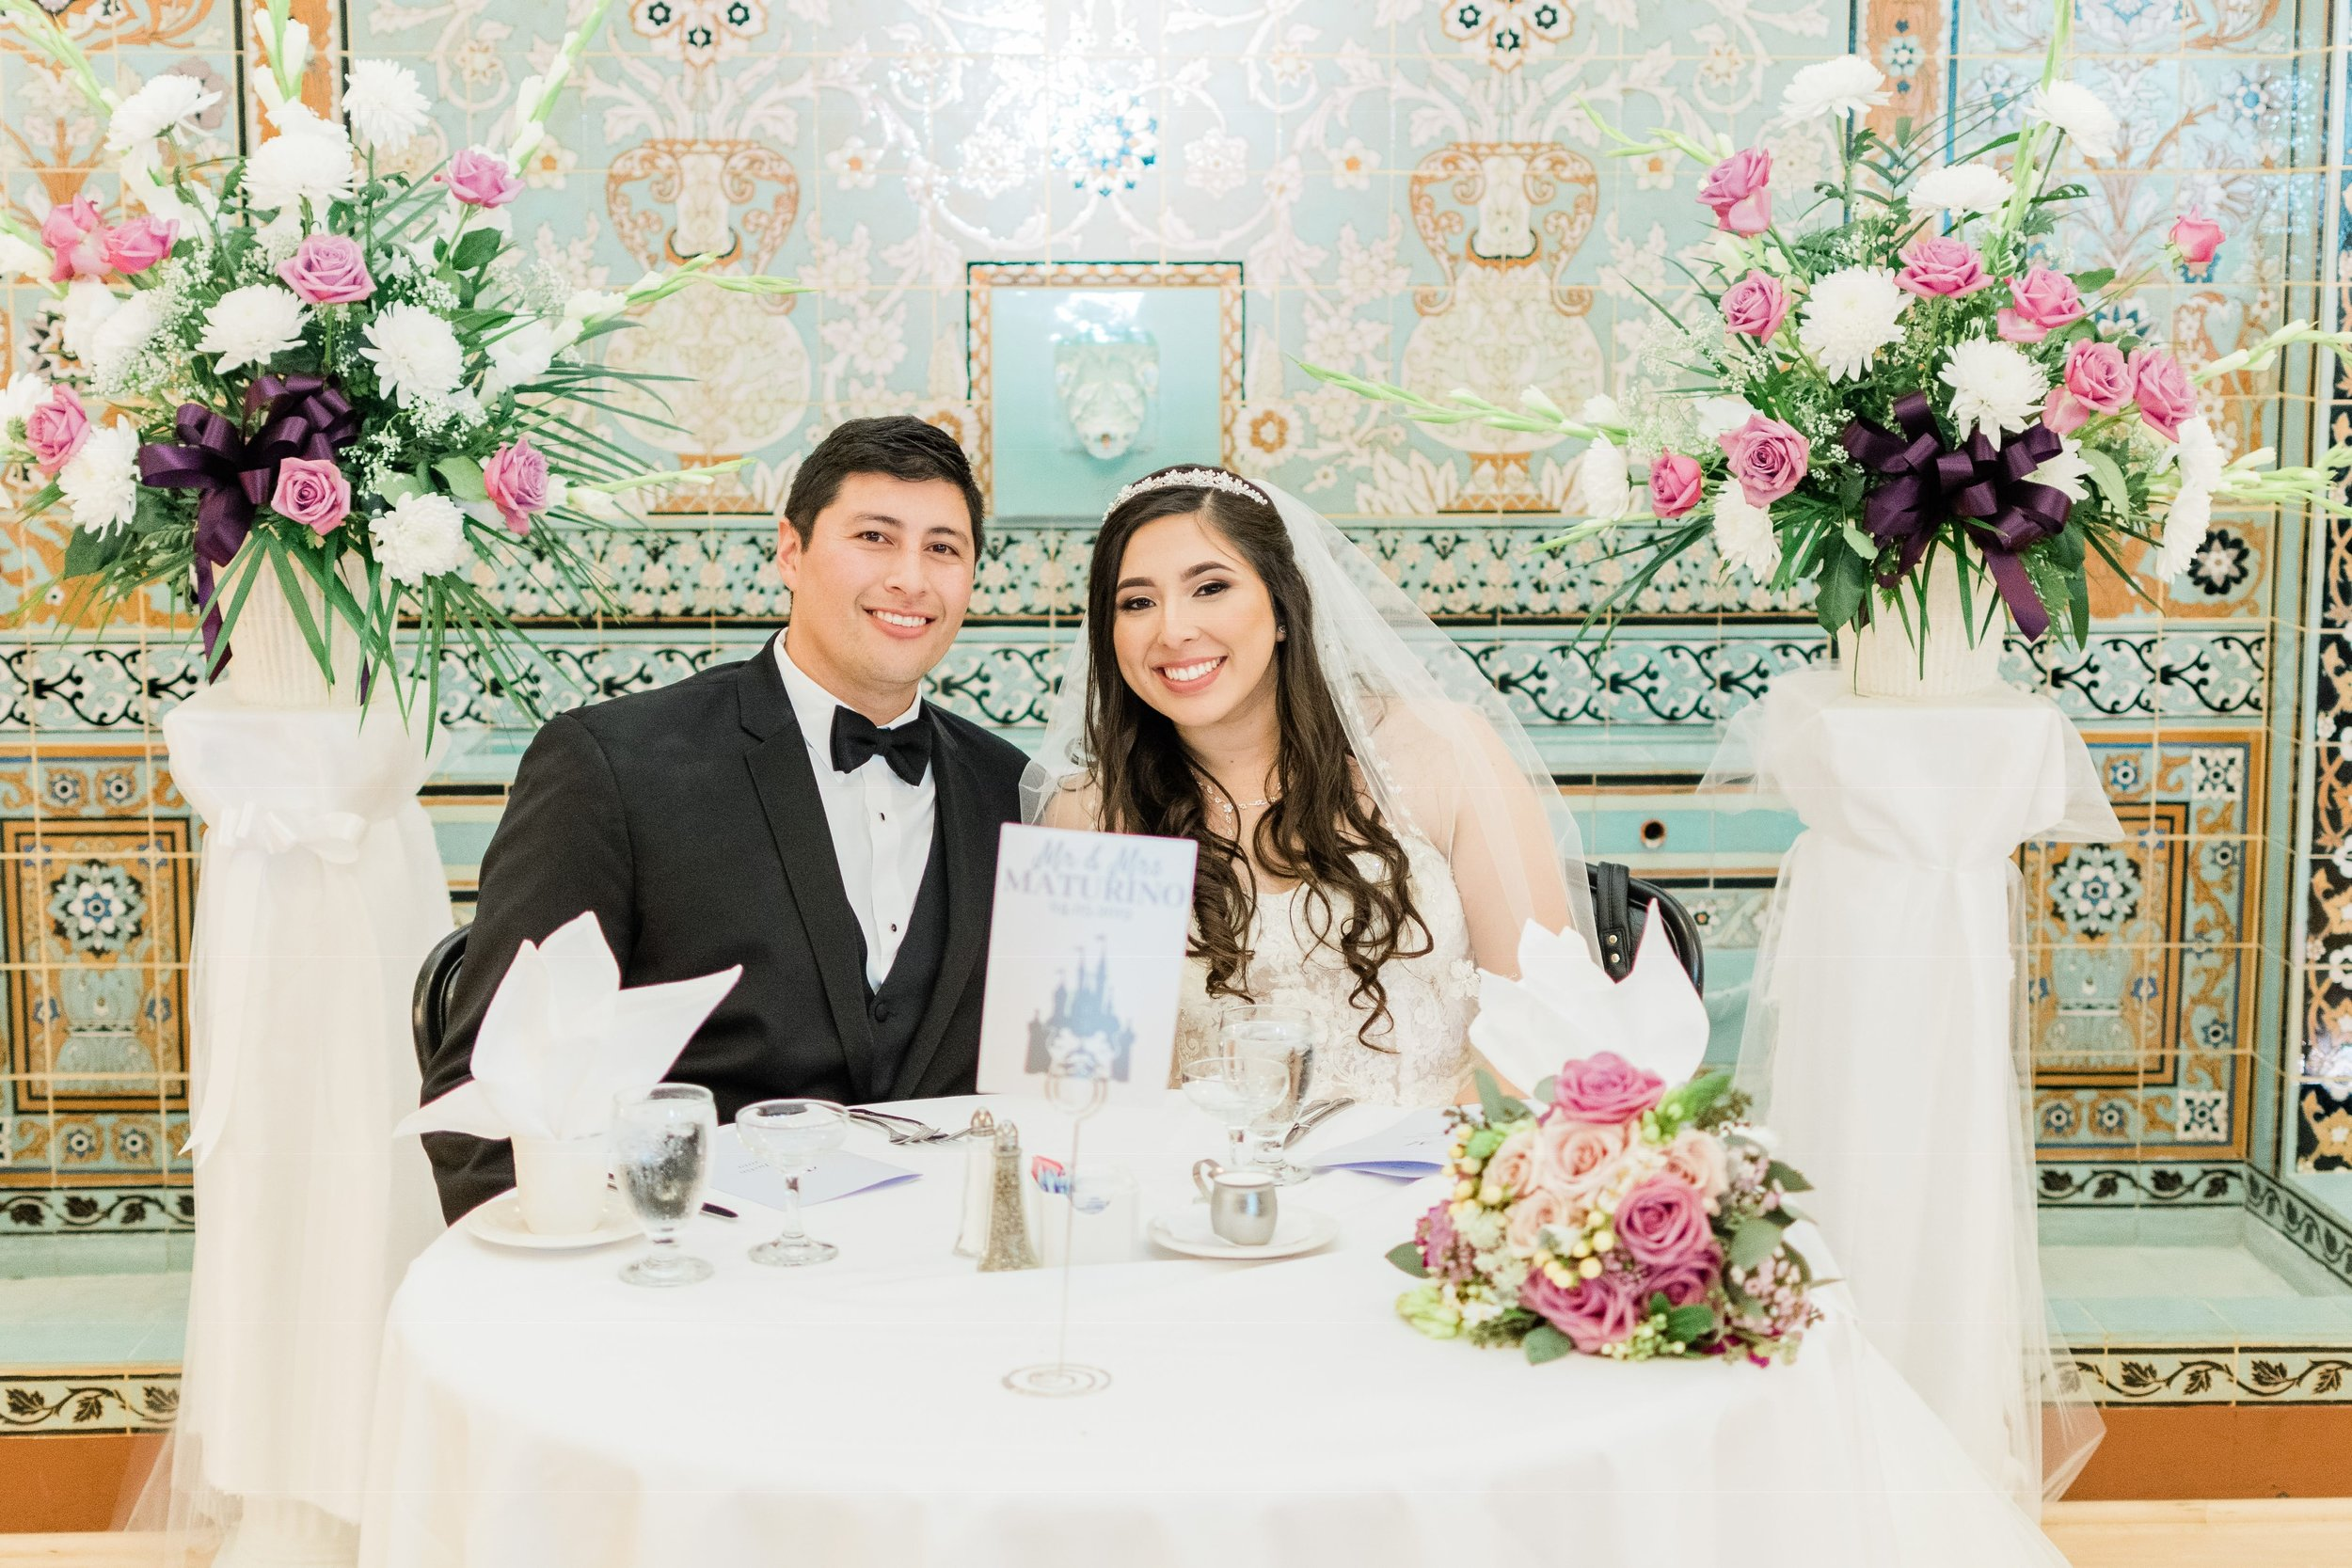 naval-postgraduate-school-wedding-in-monterey-ca-drew-zavala-photo-justin+janelle-1-min.jpg